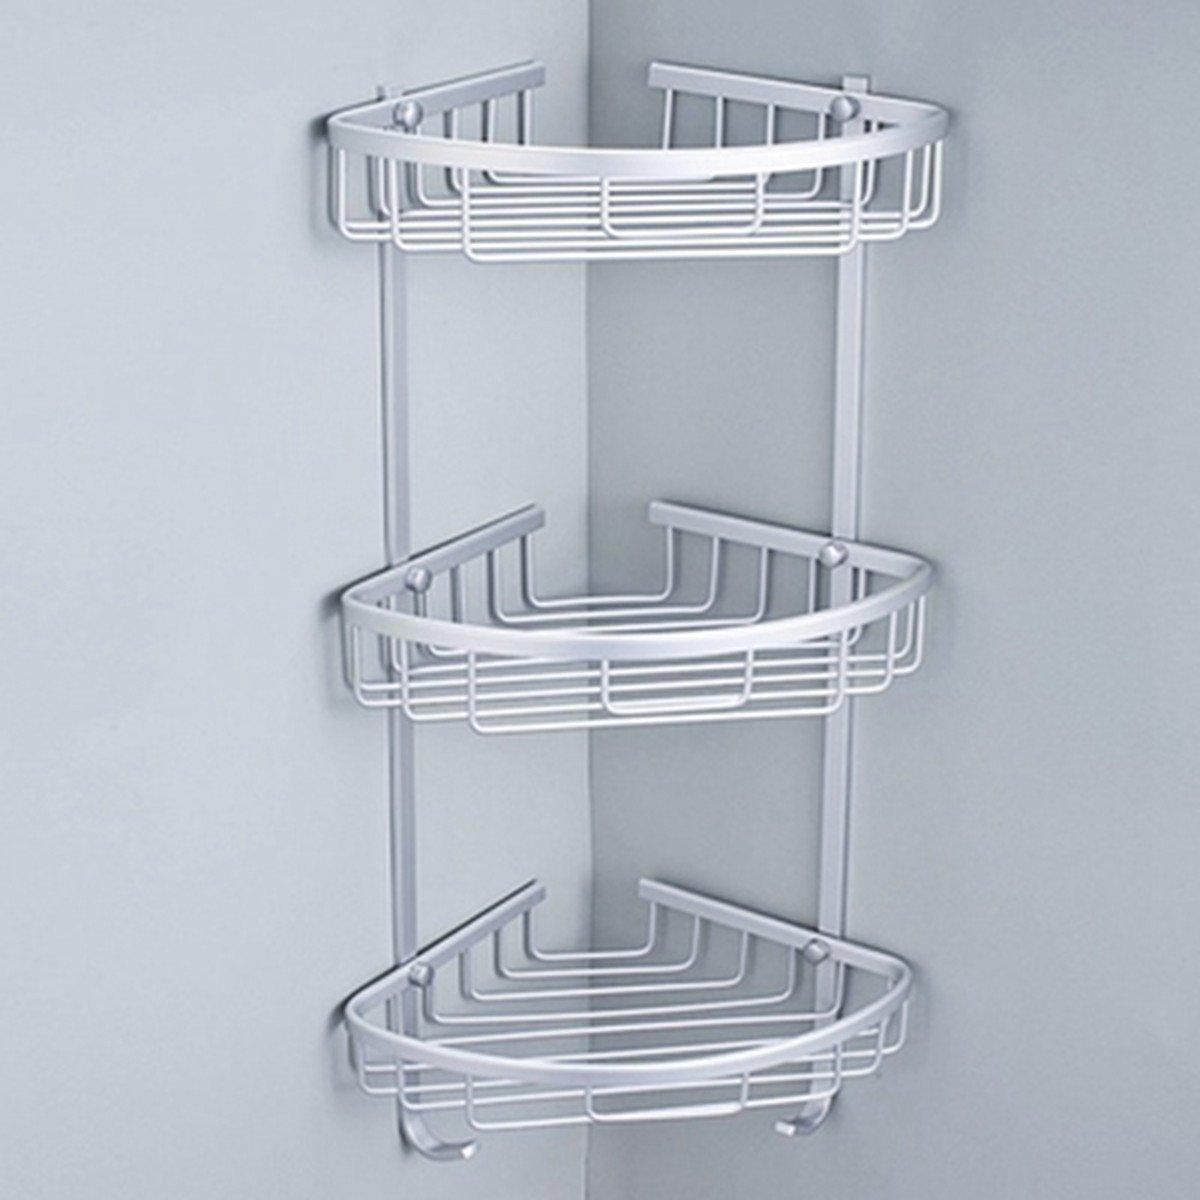 KING DO WAY Shower Bathroom Corner Shelf Storage Organizer Holder Basket Rack with Towel Hook Stainless Steel Wall Mount 3layers